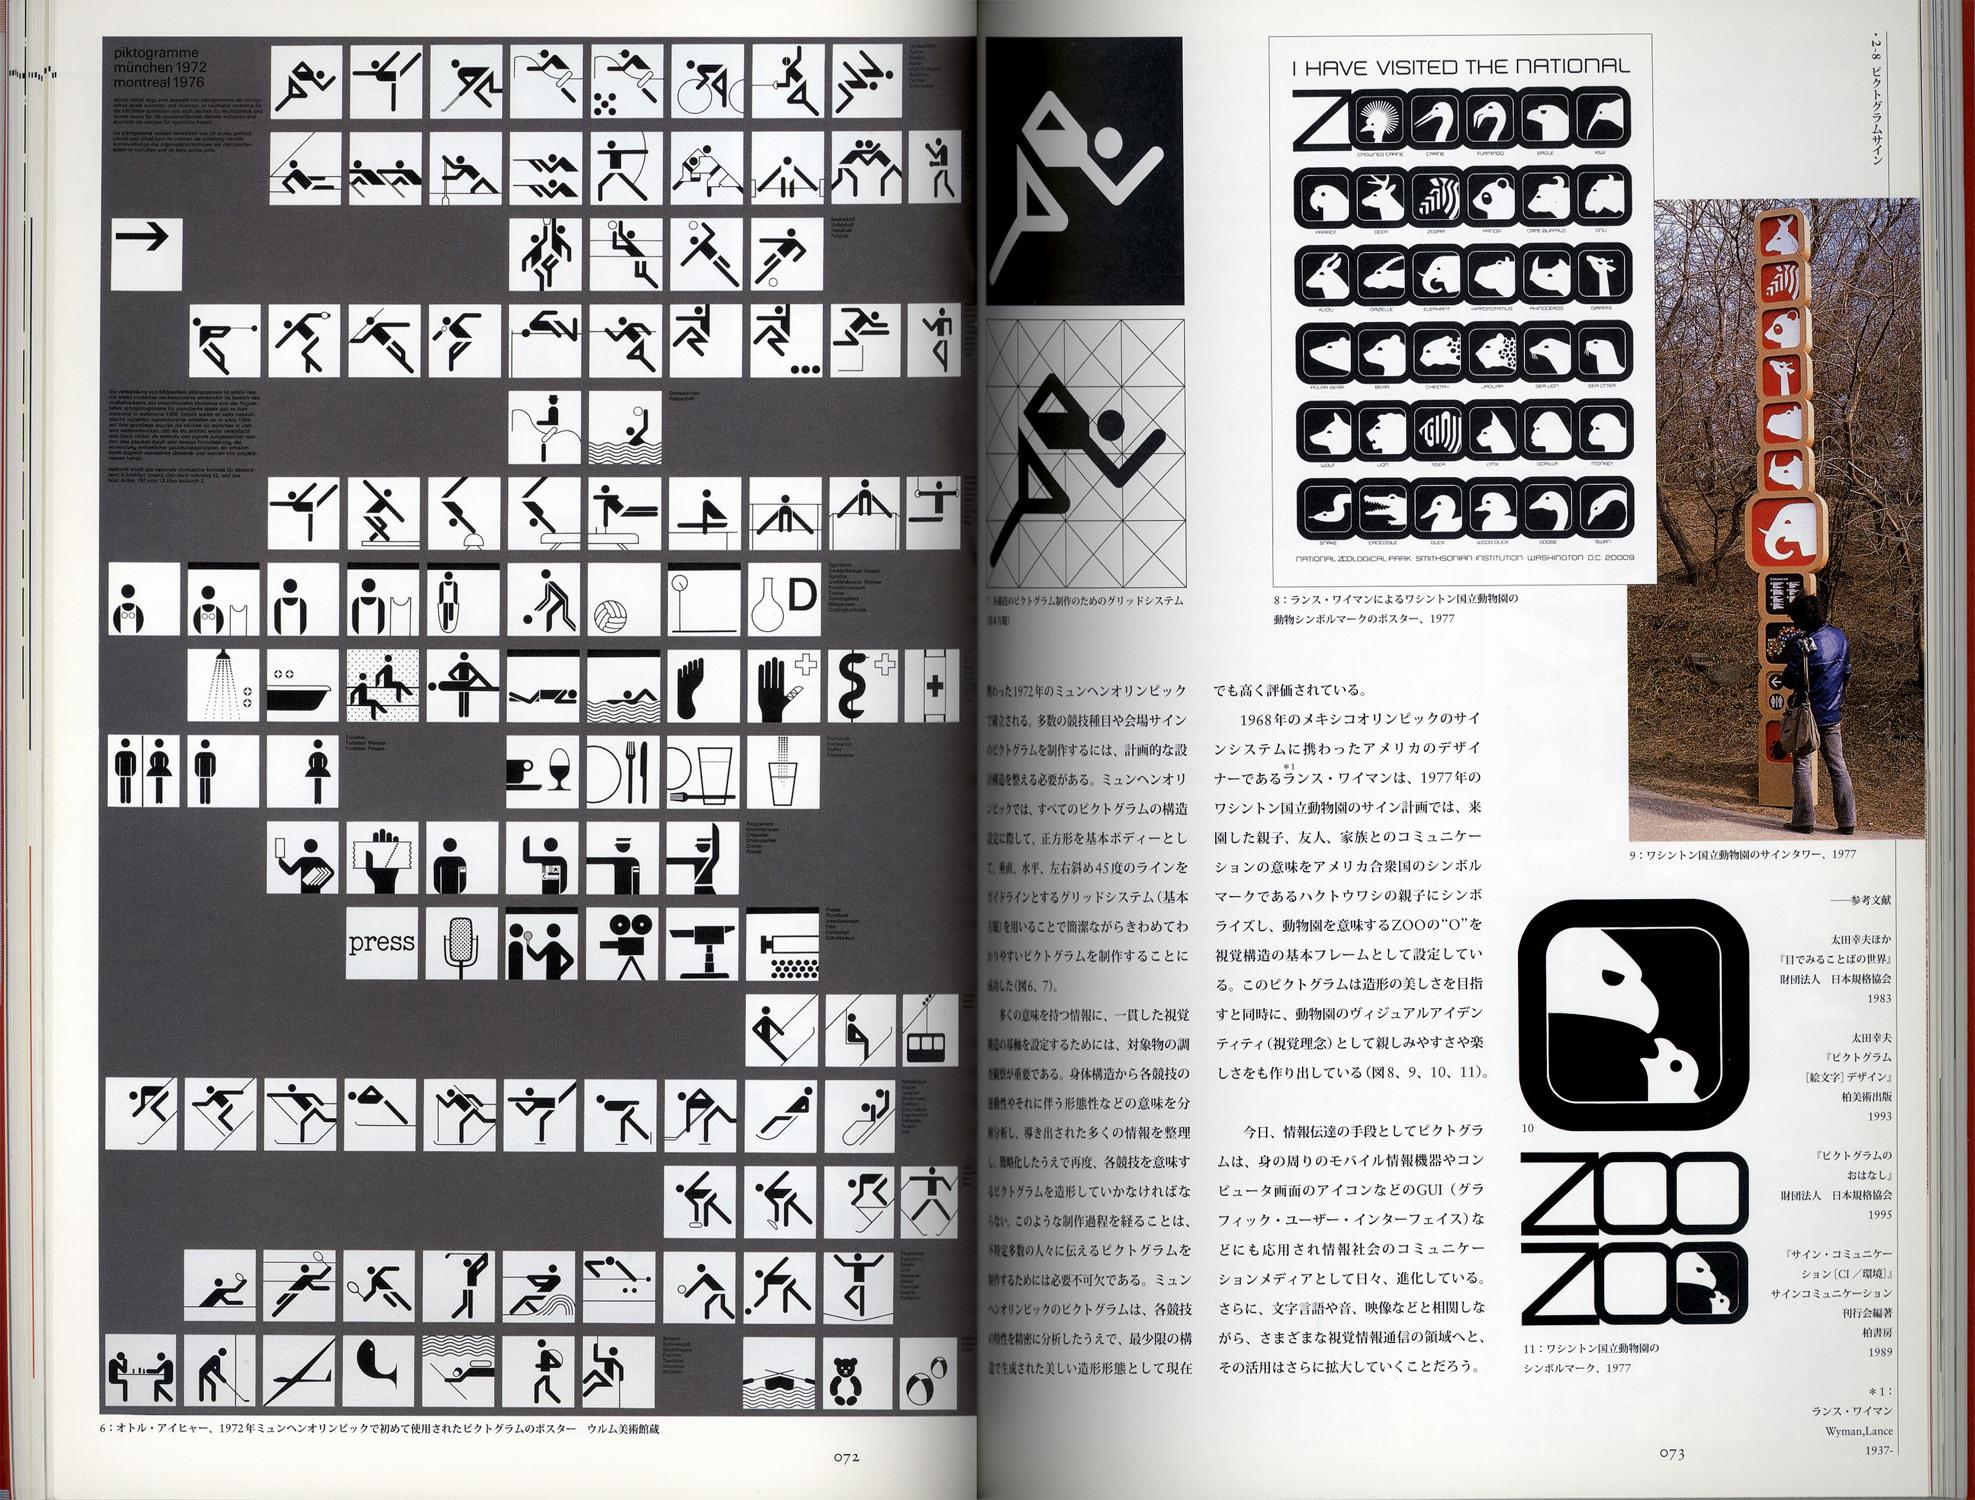 graphic design 視覚伝達デザイン基礎[image4]